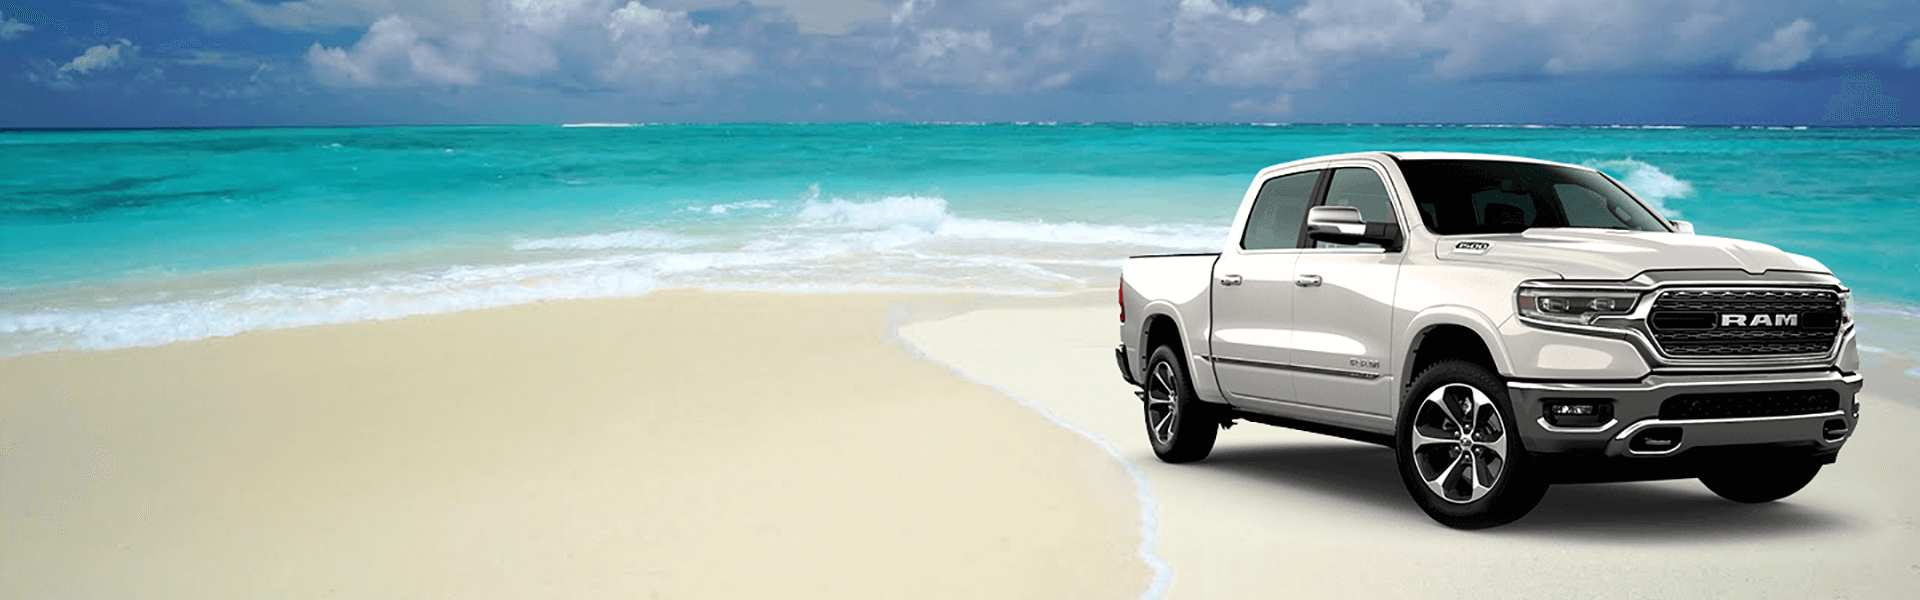 Rick-Hendrick-Jeep-Chrysler-Dodge-RAM-Mar21_TR_Homepage-Header-option2-1920x600